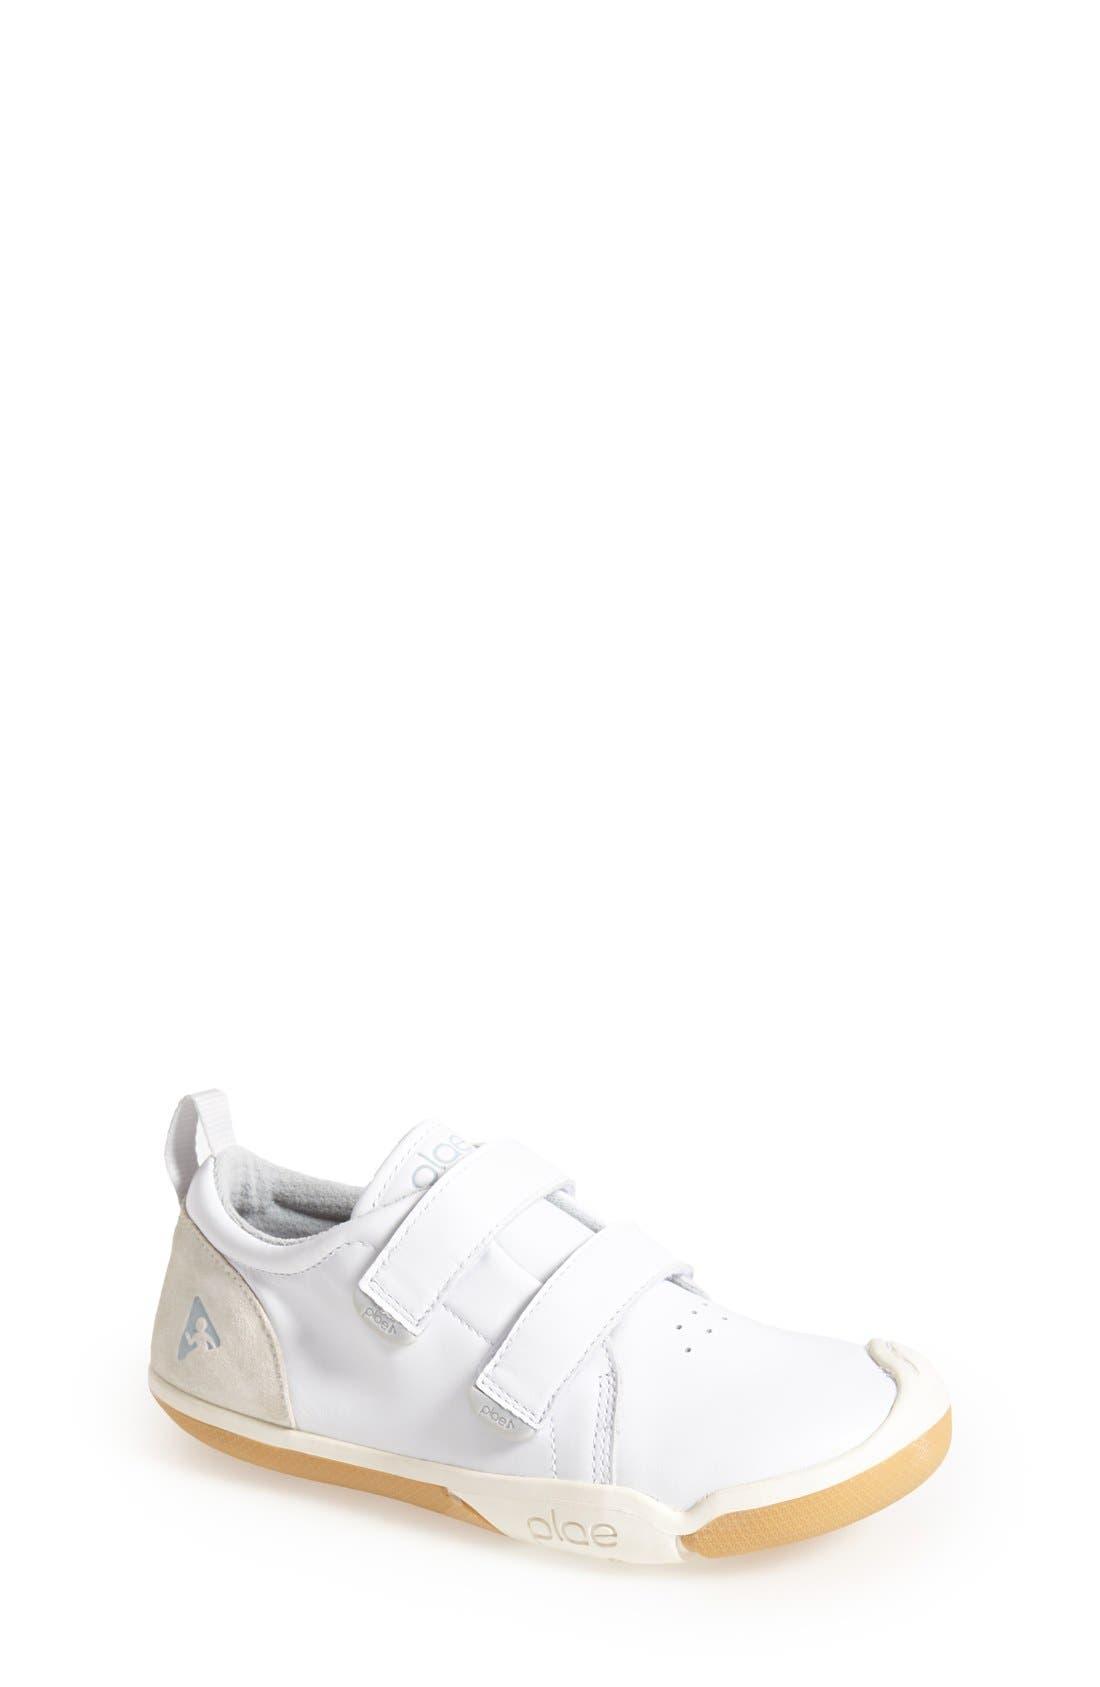 PLAE 'Roan' Customizable Leather Sneaker (Toddler & Little Kid)